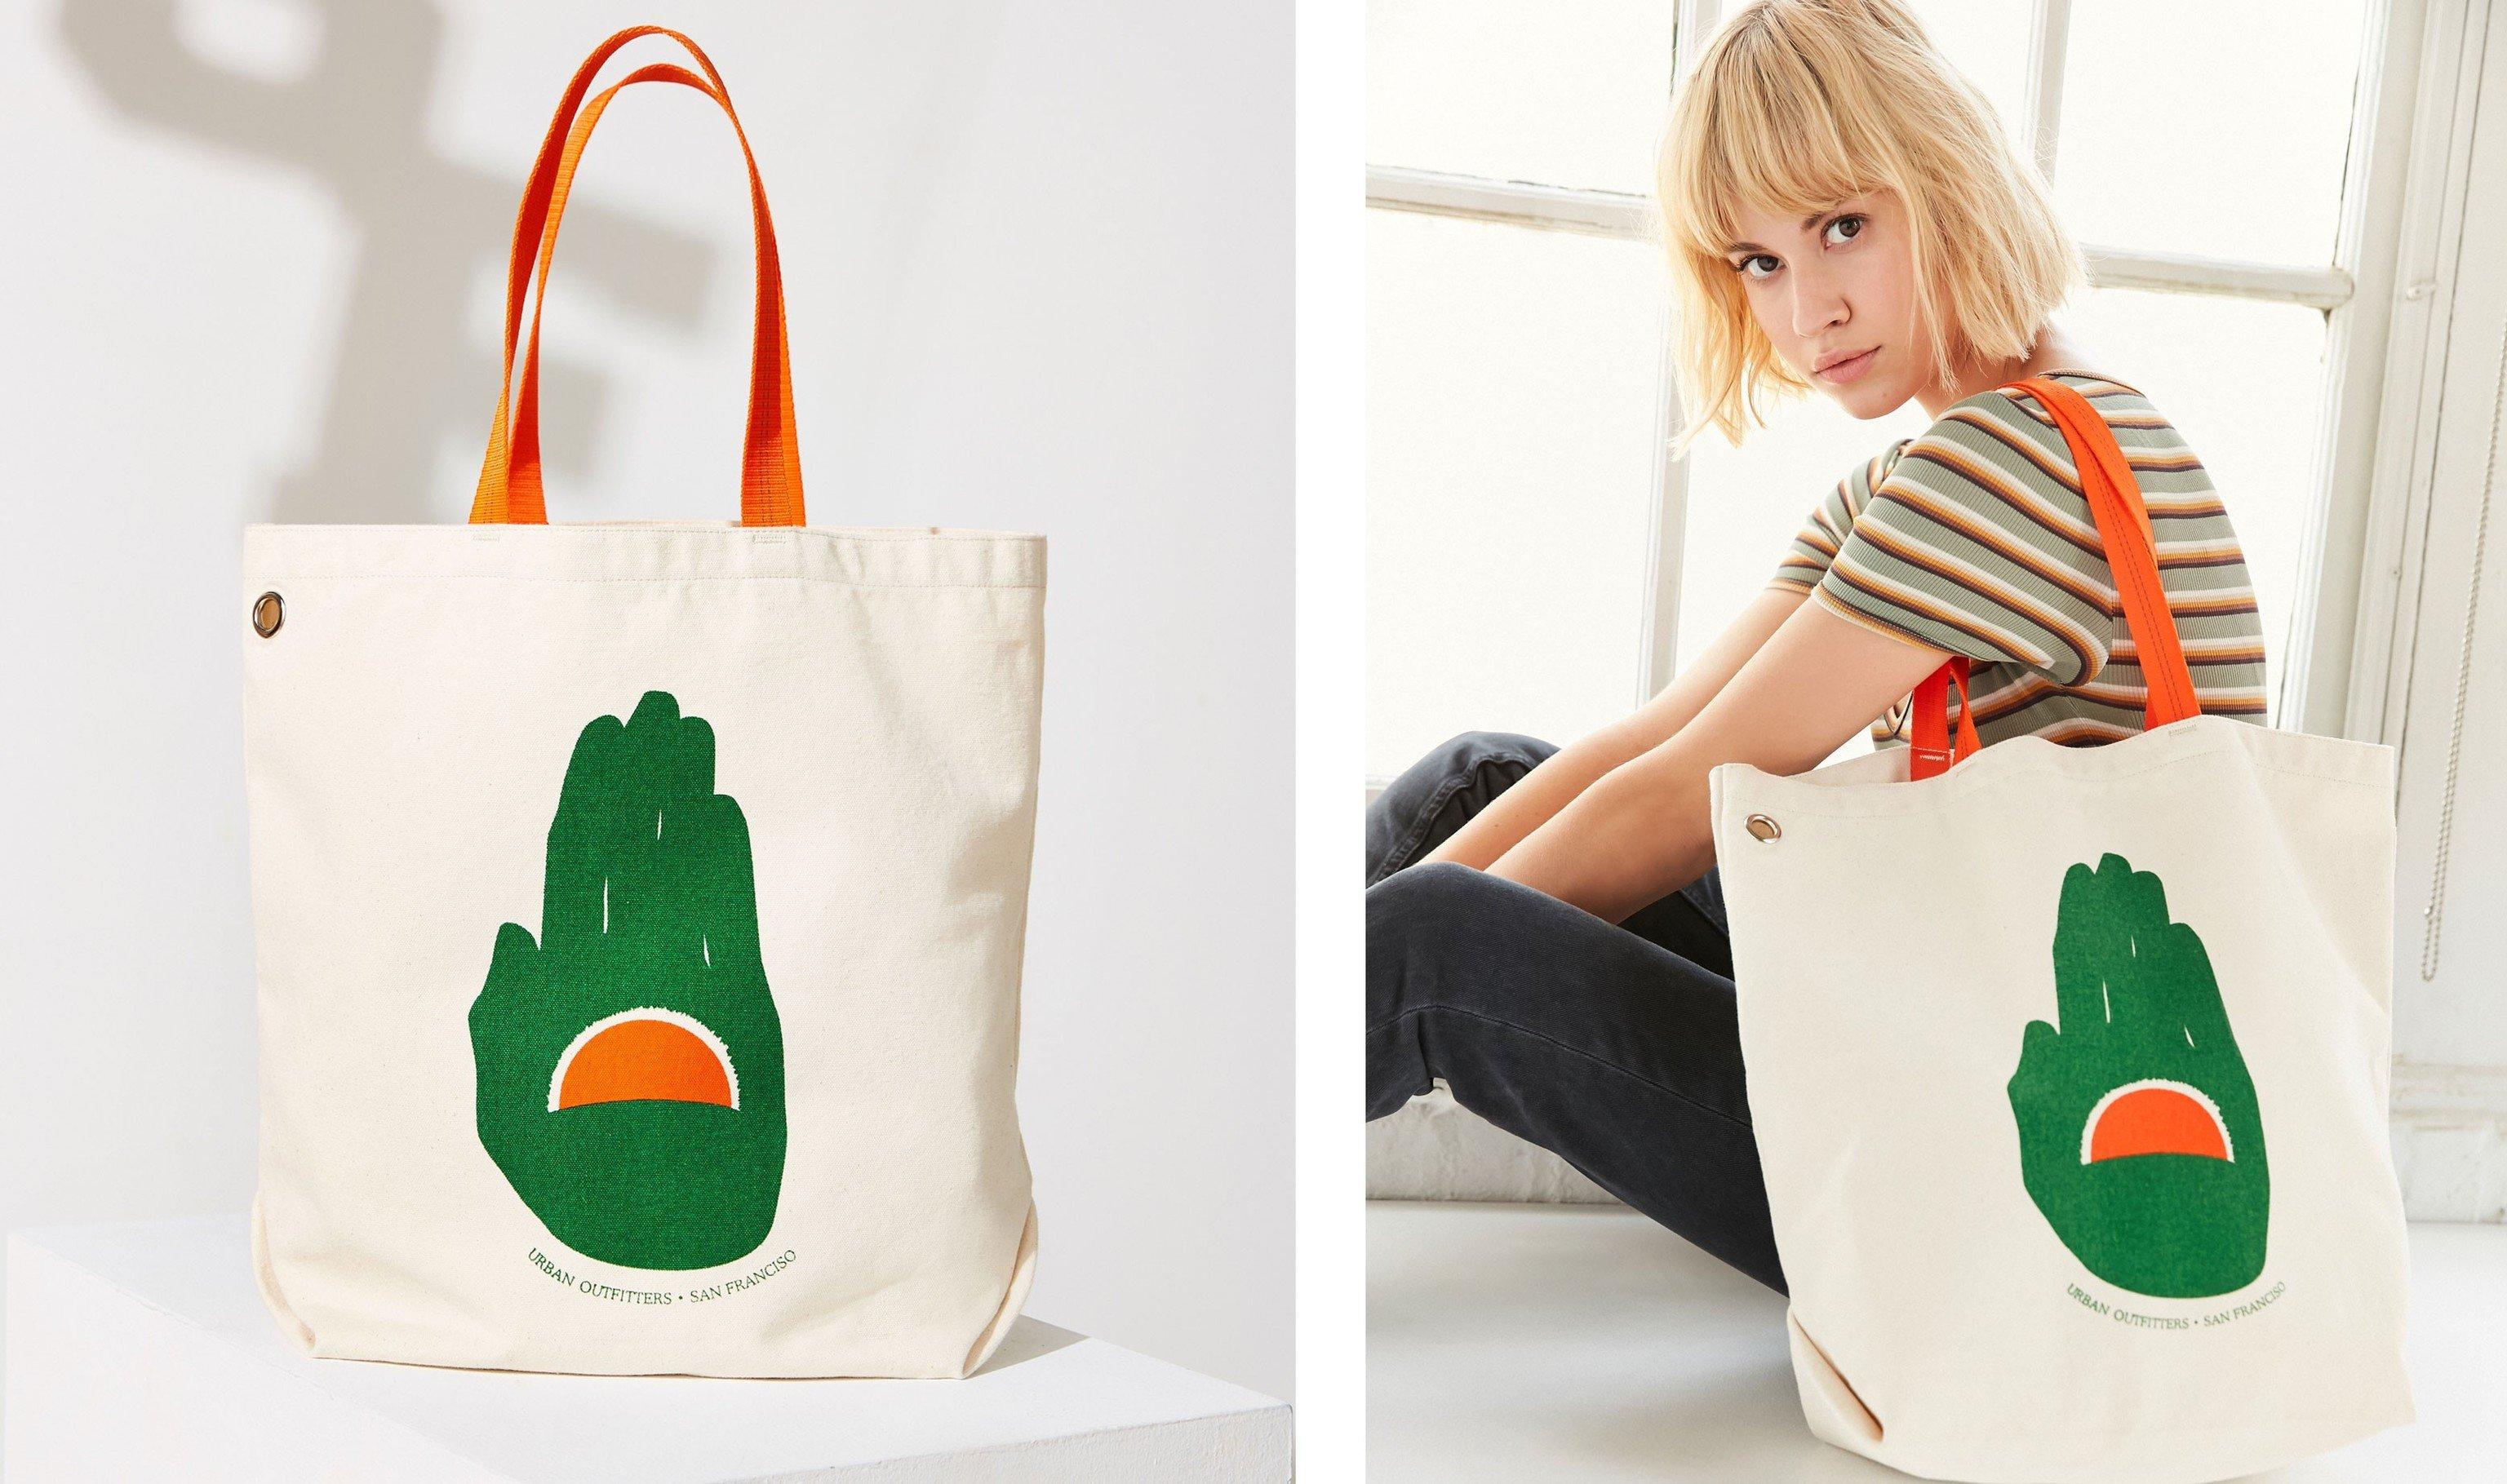 Style + Design handbag bag person green product tote bag fashion accessory brand orange